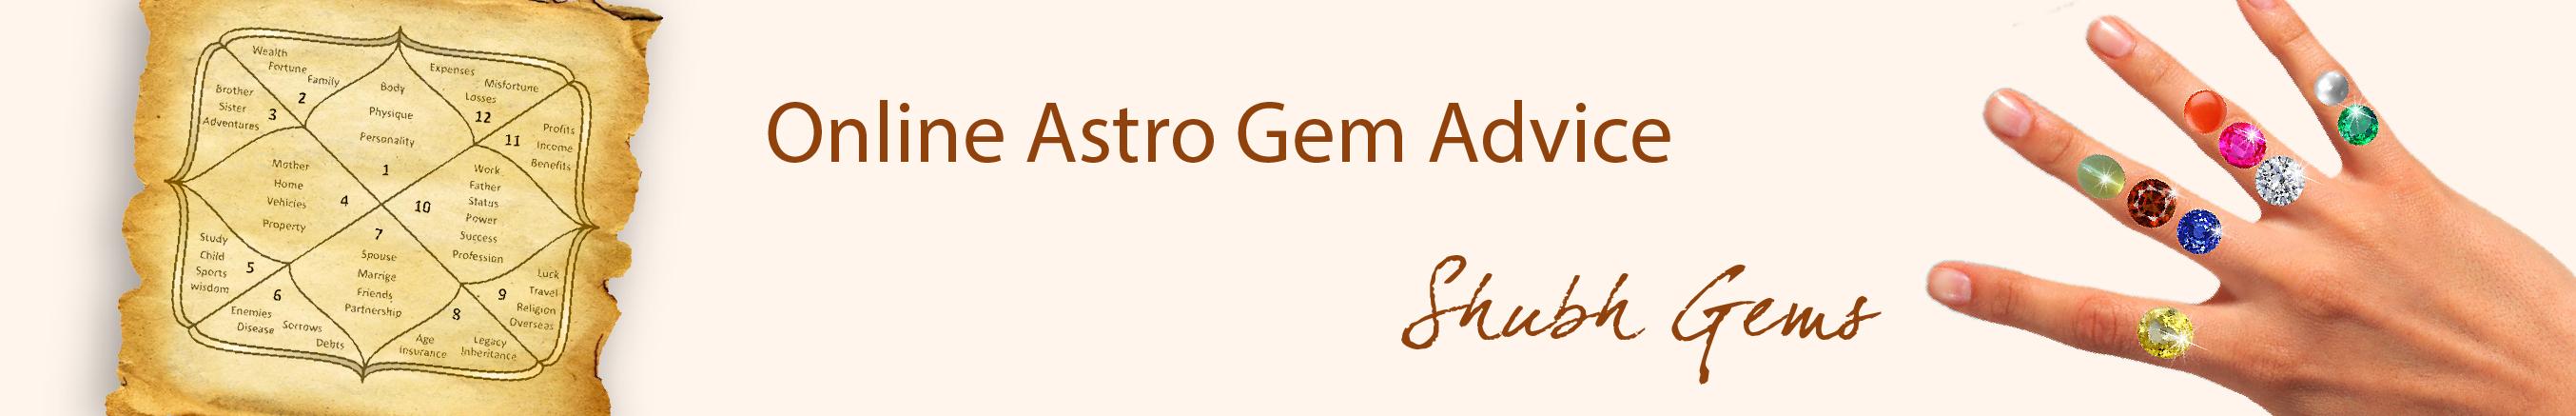 Astro Advice Banner